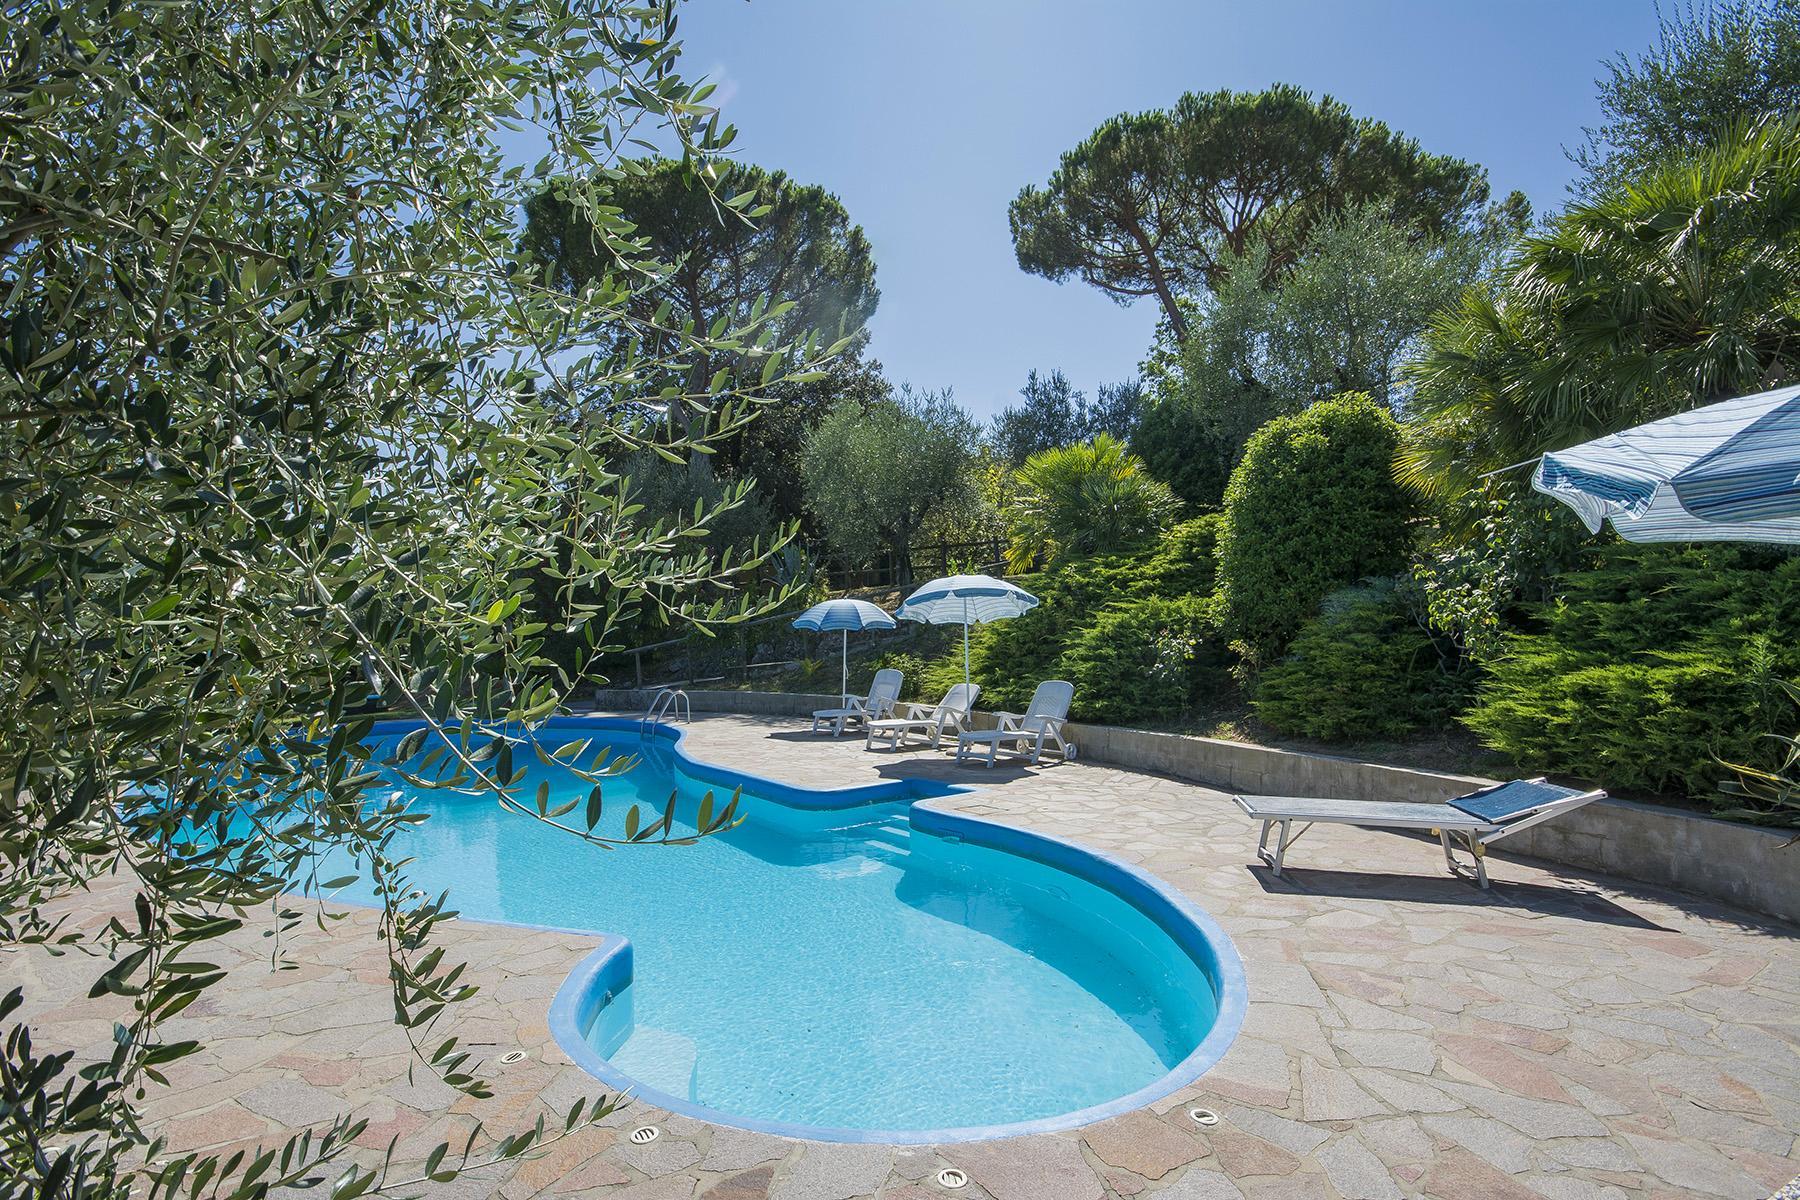 Prestigious Tuscan villa near to Montecatini Terme Golf Course - 4